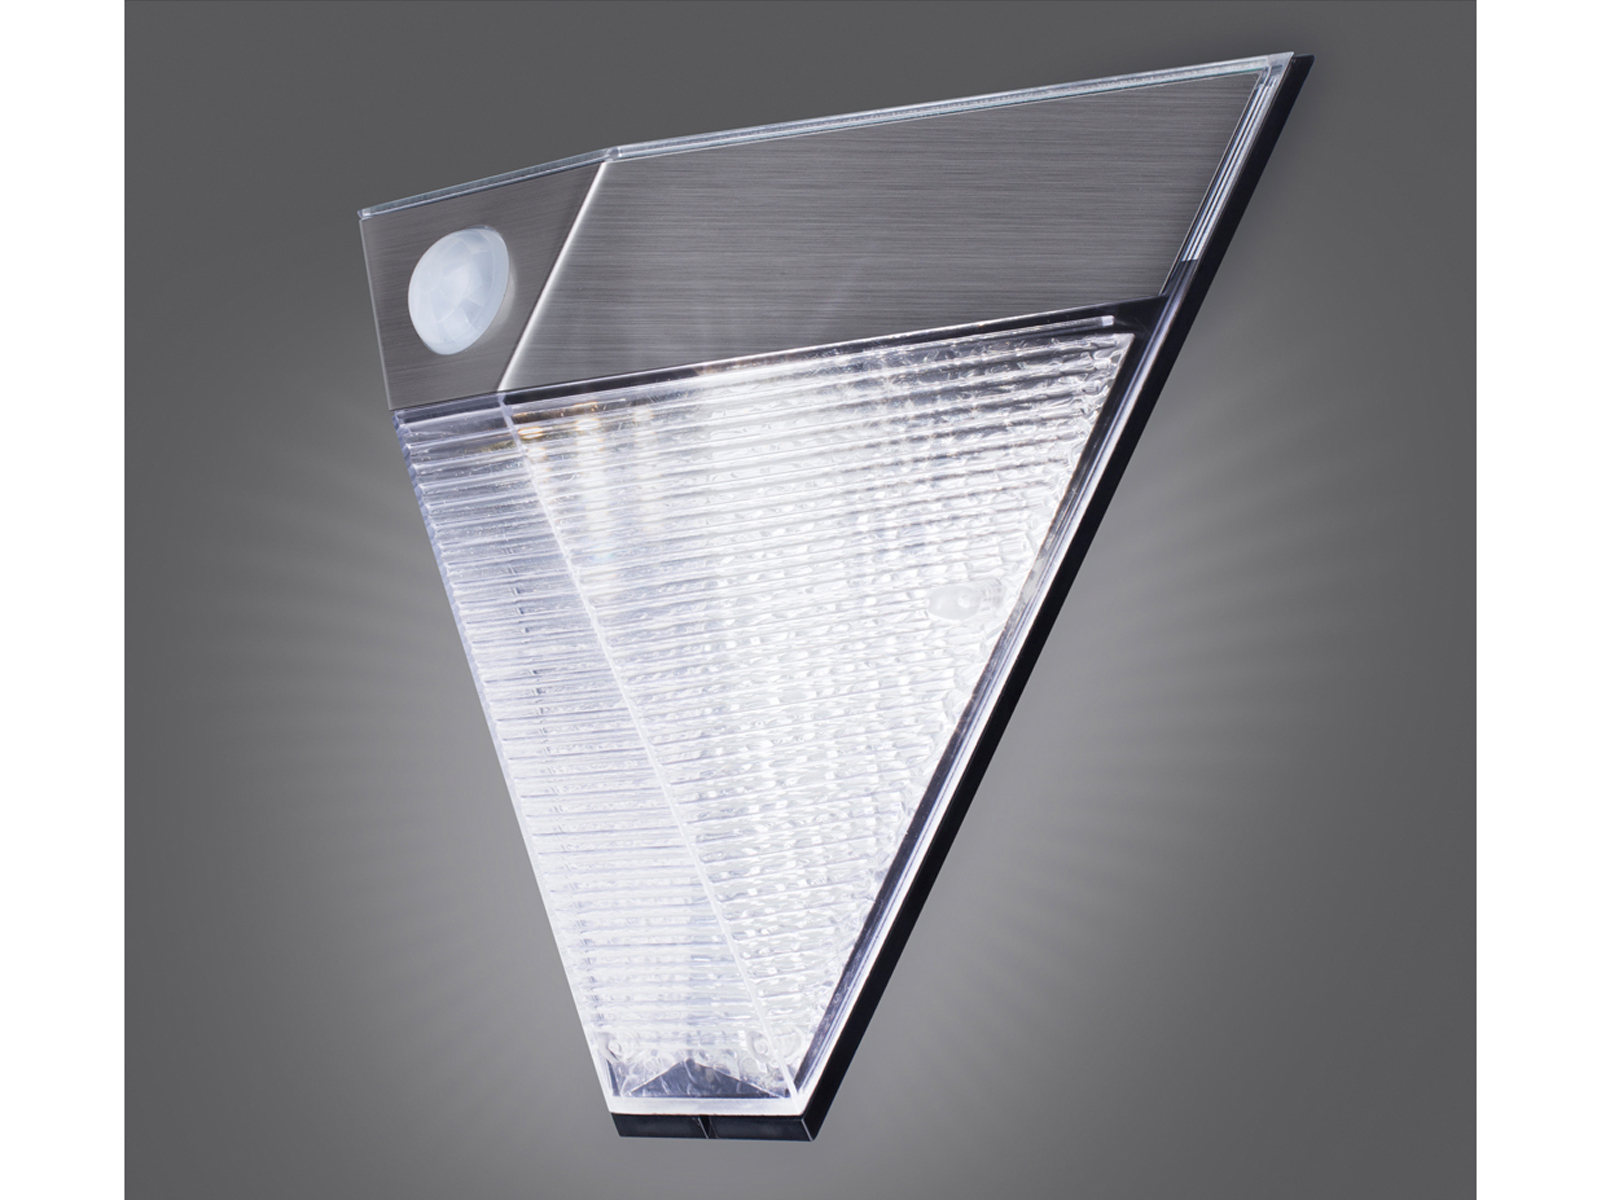 solar led au enwandleuchte bewegungsmelder dreieckige au enleuchte garten ip43 ebay. Black Bedroom Furniture Sets. Home Design Ideas